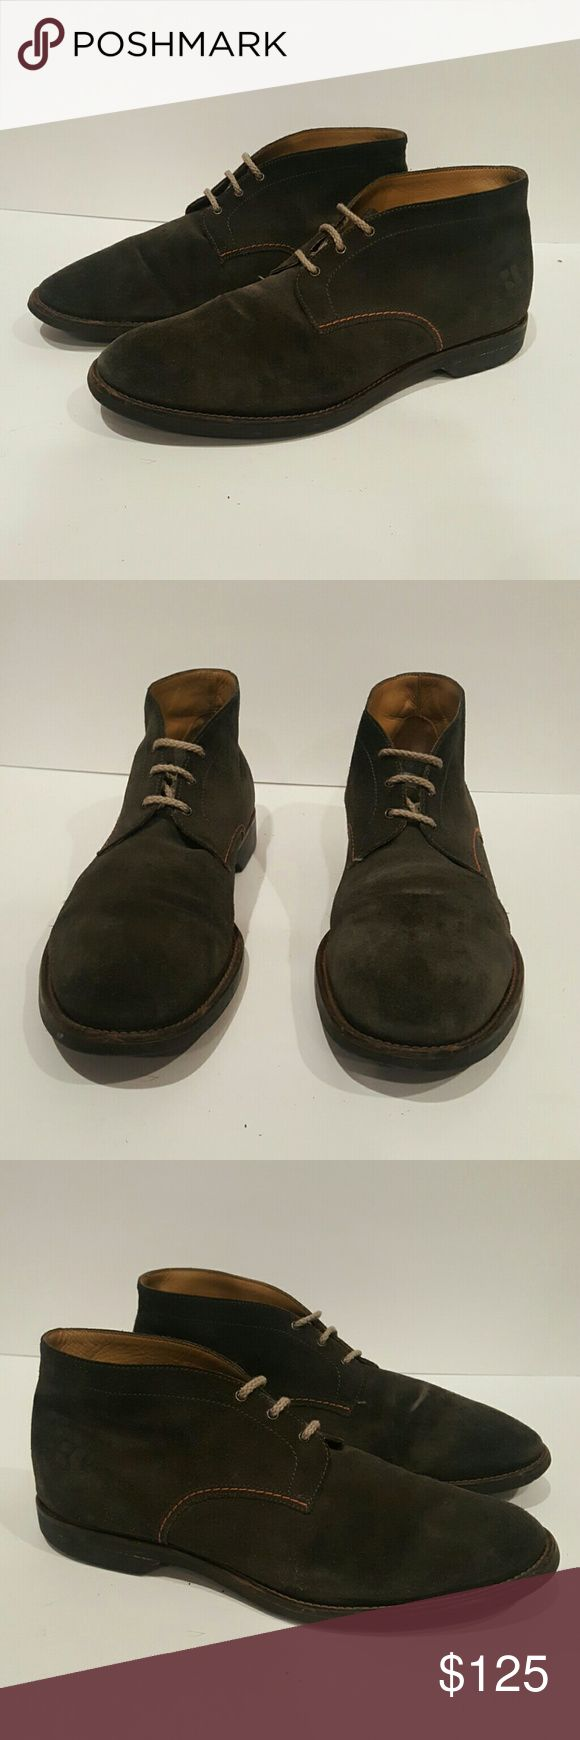 HUGO BOSS ORANGE GREY BOOTS SIZE 43 HUGO BOSS ORANGE LABEL MENS 43 GREY SUEDE CHUKKA BOOTS DESERT BOOTS LOTS OF LIFE LEFT EUC Hugo Boss Shoes Chukka Boots